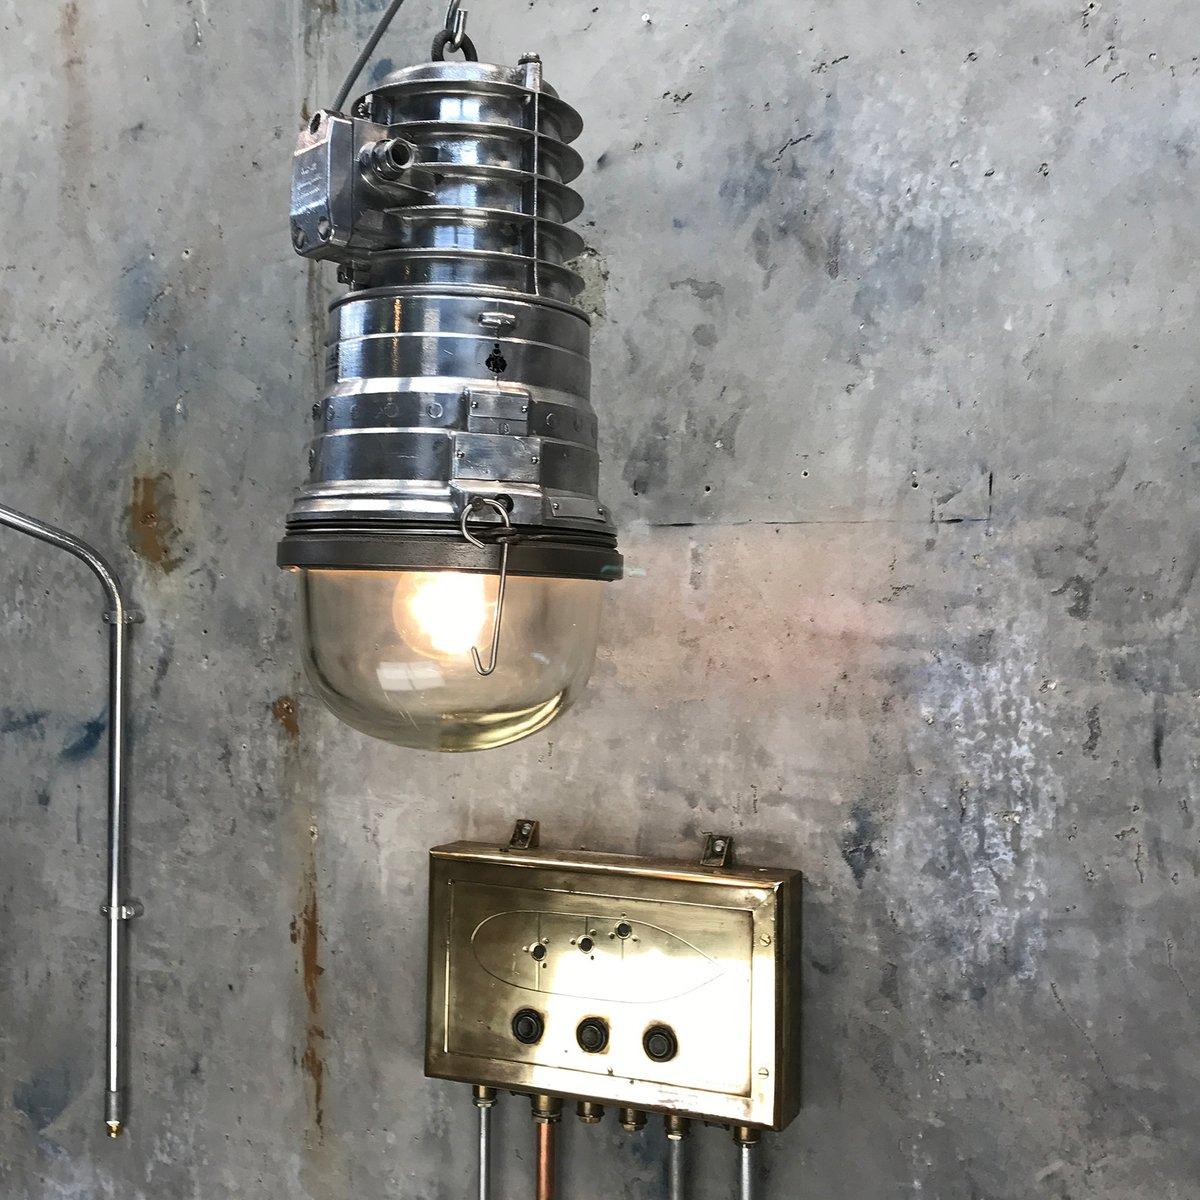 Aluminium Industrial Explosion Proof Pendant Light From